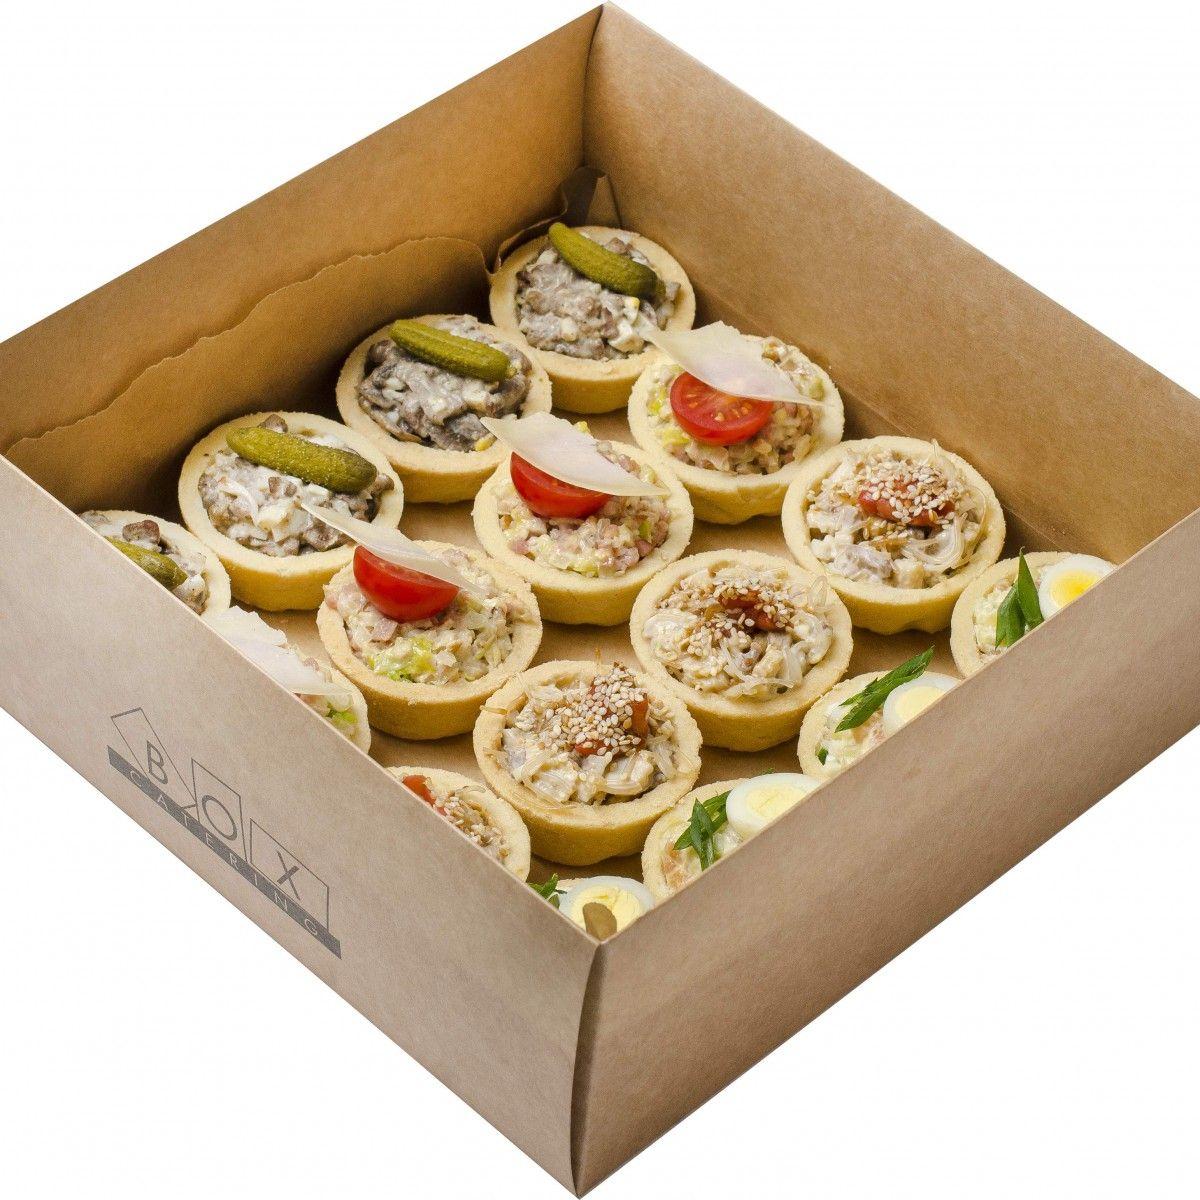 Salad smart box фото 3